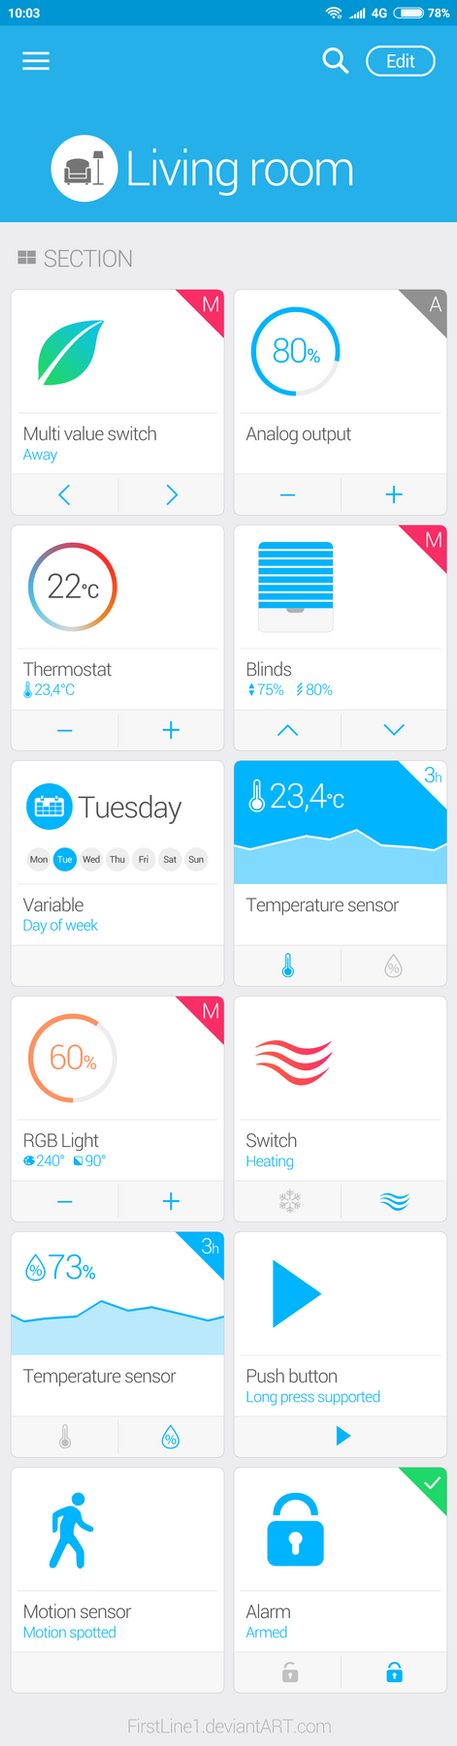 Smart Home App Design by FirstLine1